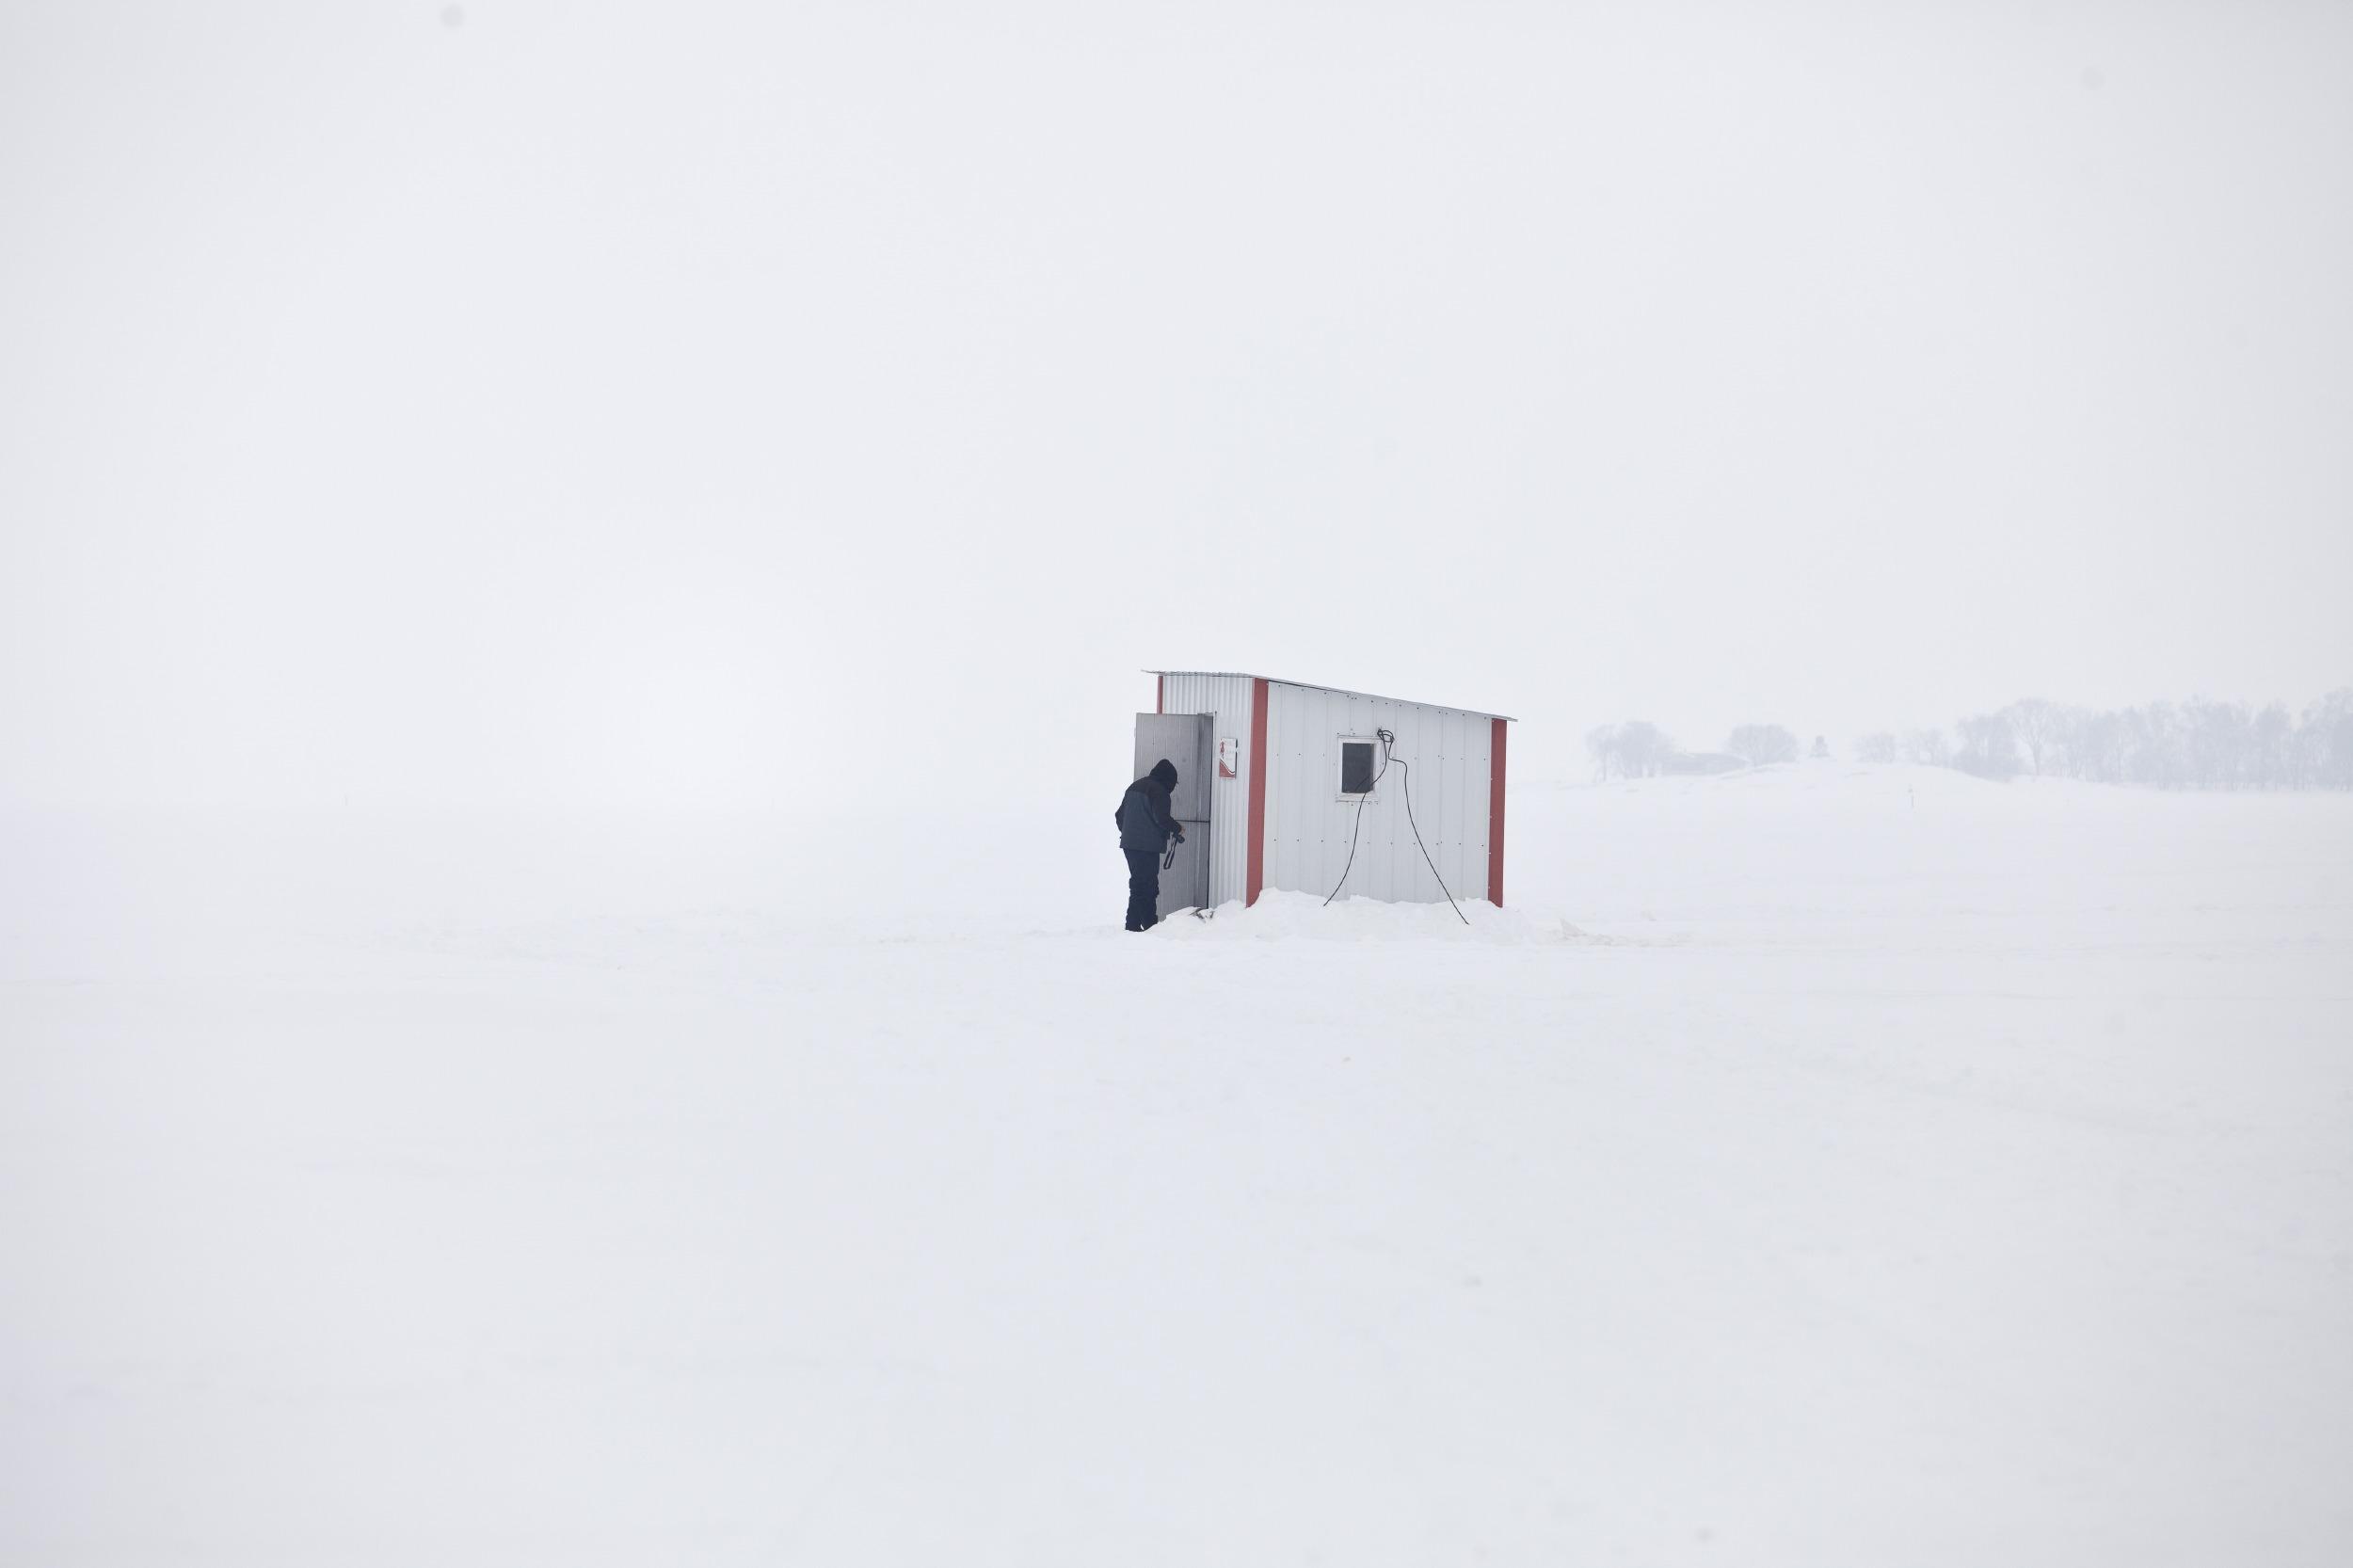 IceFishing_PopularMechanics_25.JPG